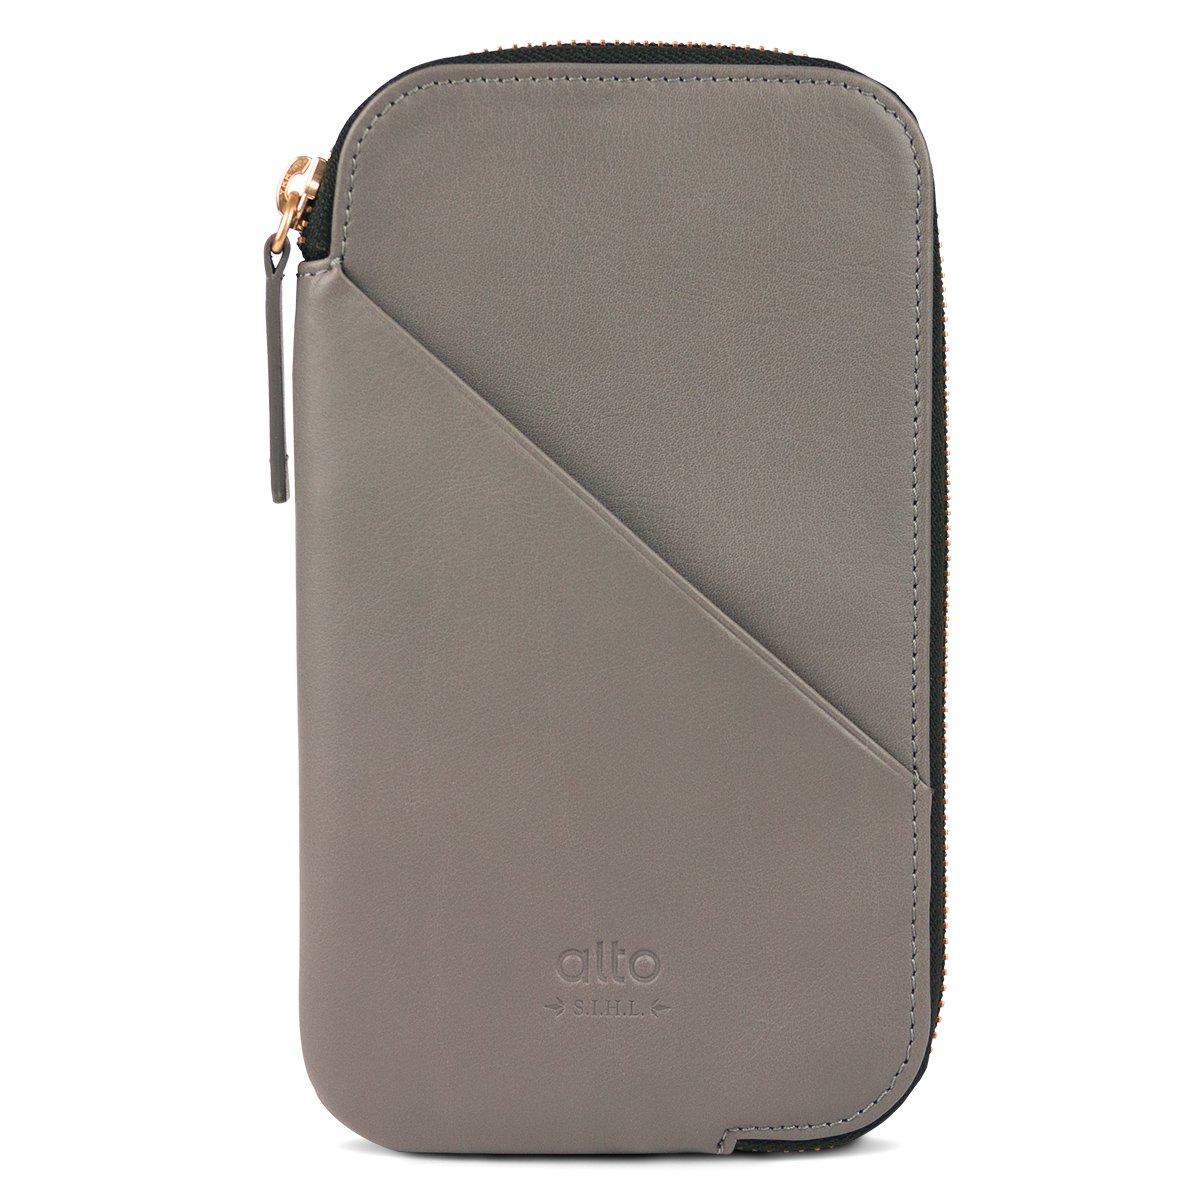 alto Handmade Premium Italian Leather for Apple iPhone 7 / iPhone 7 Plus / iPhone 8 / iPhone 8 Plus / iPhone X Travel Phone Wallet (Cement)